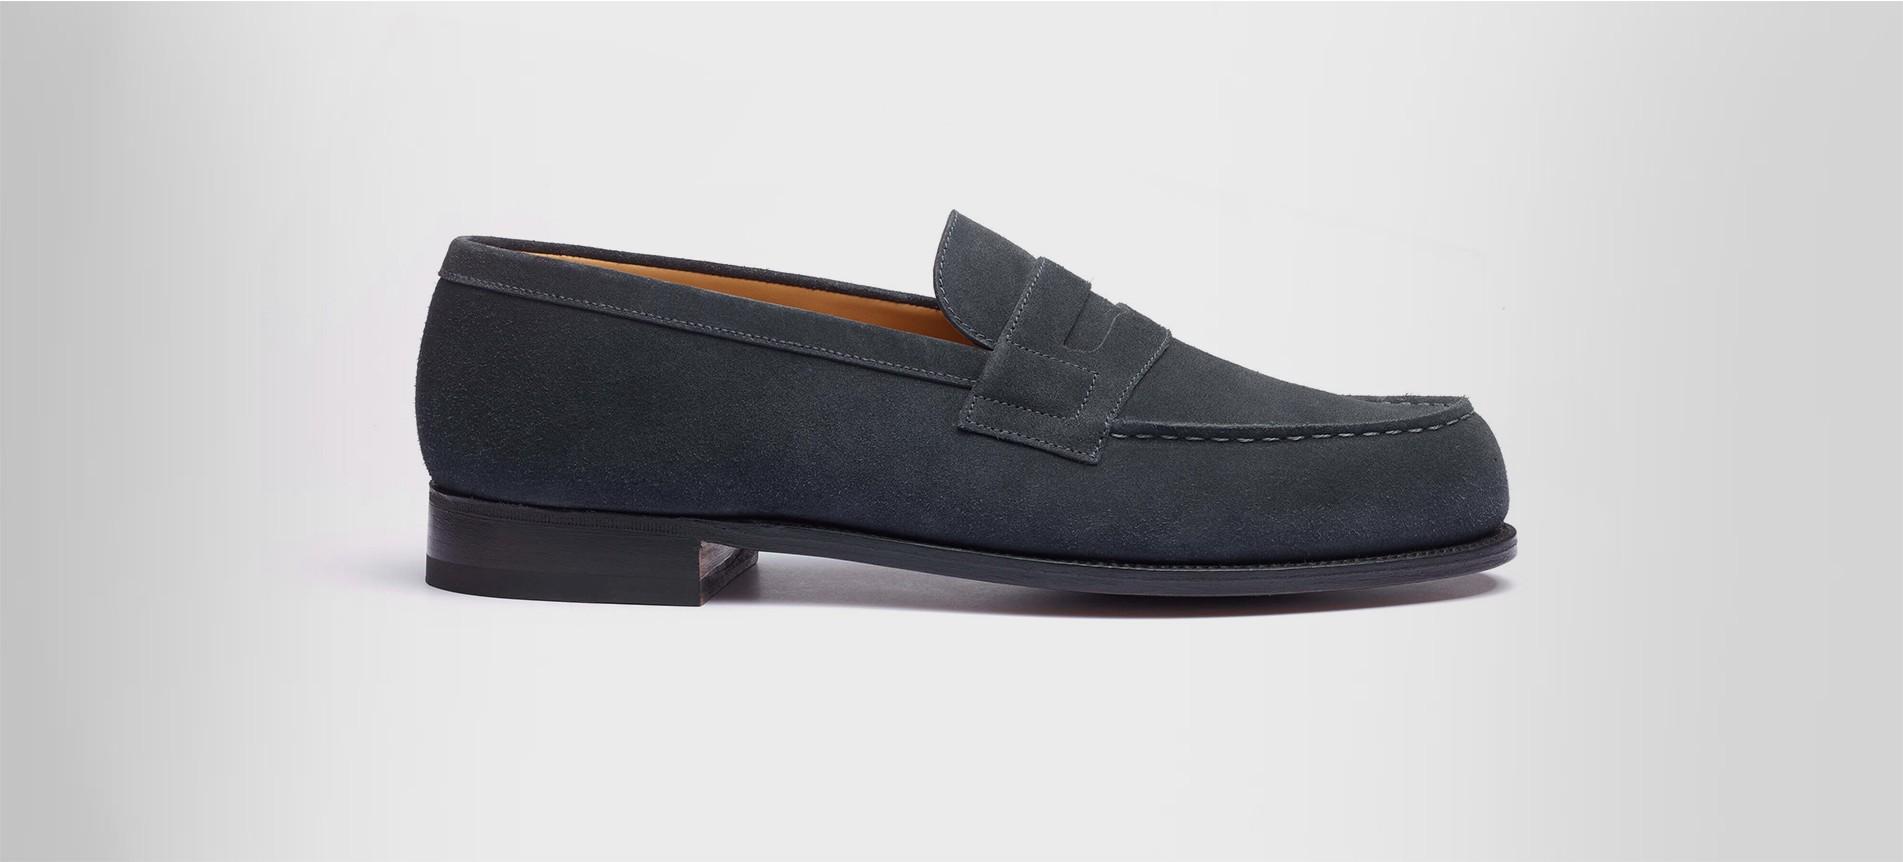 c371891f8c33f Mocassin 180 Grey suede calfskin - Loafers J.M. Weston